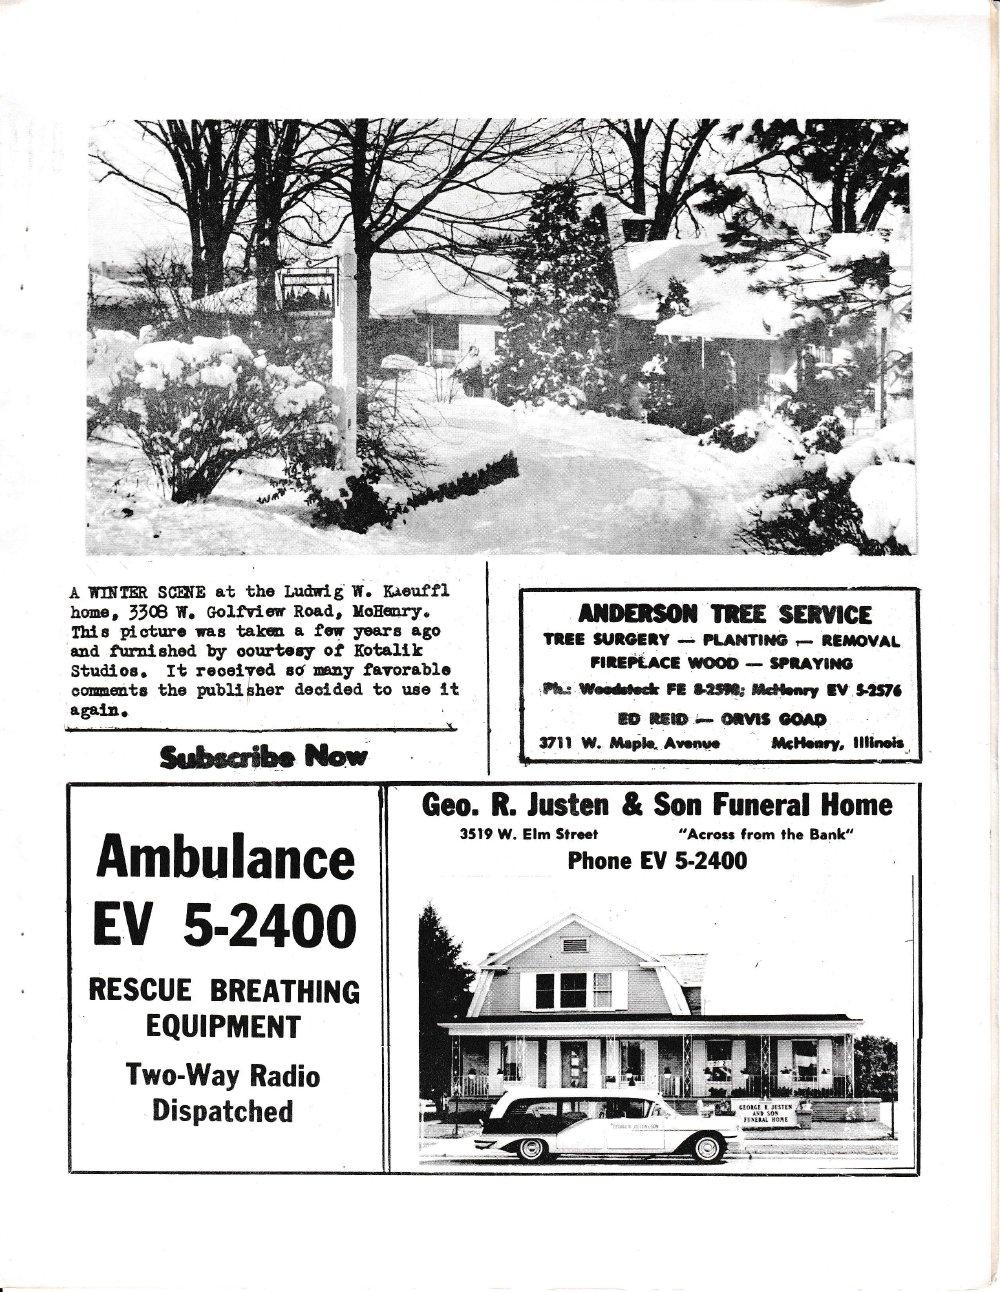 The Pictorial Newsletter: December 19, 1962